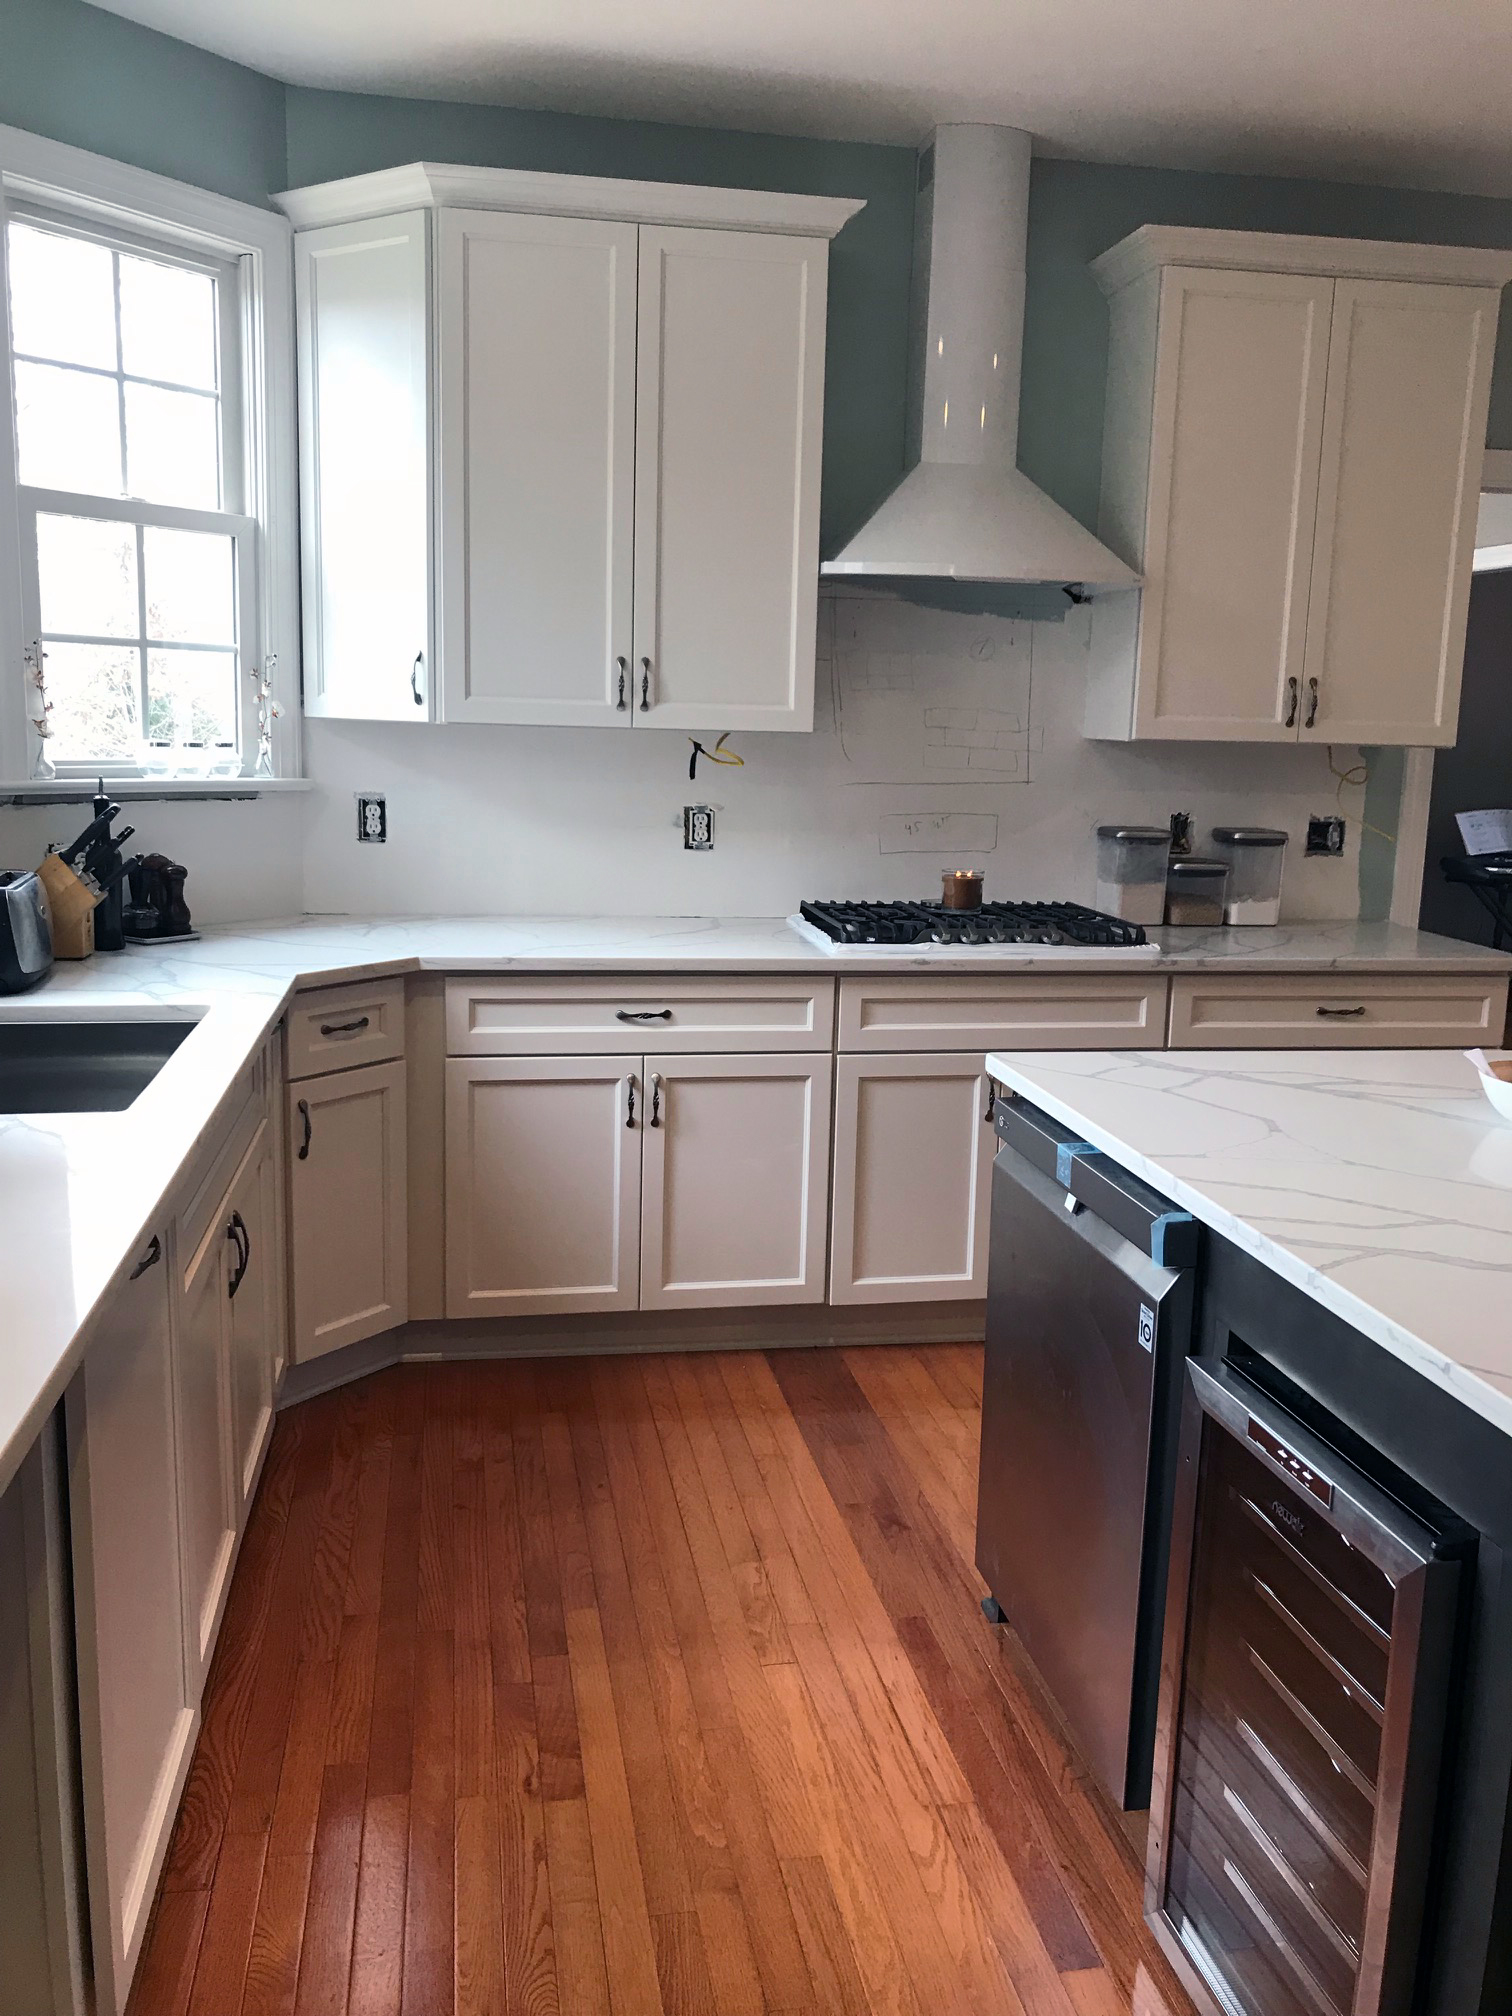 McCaffrey - Kitchen Remodel (1).jpg